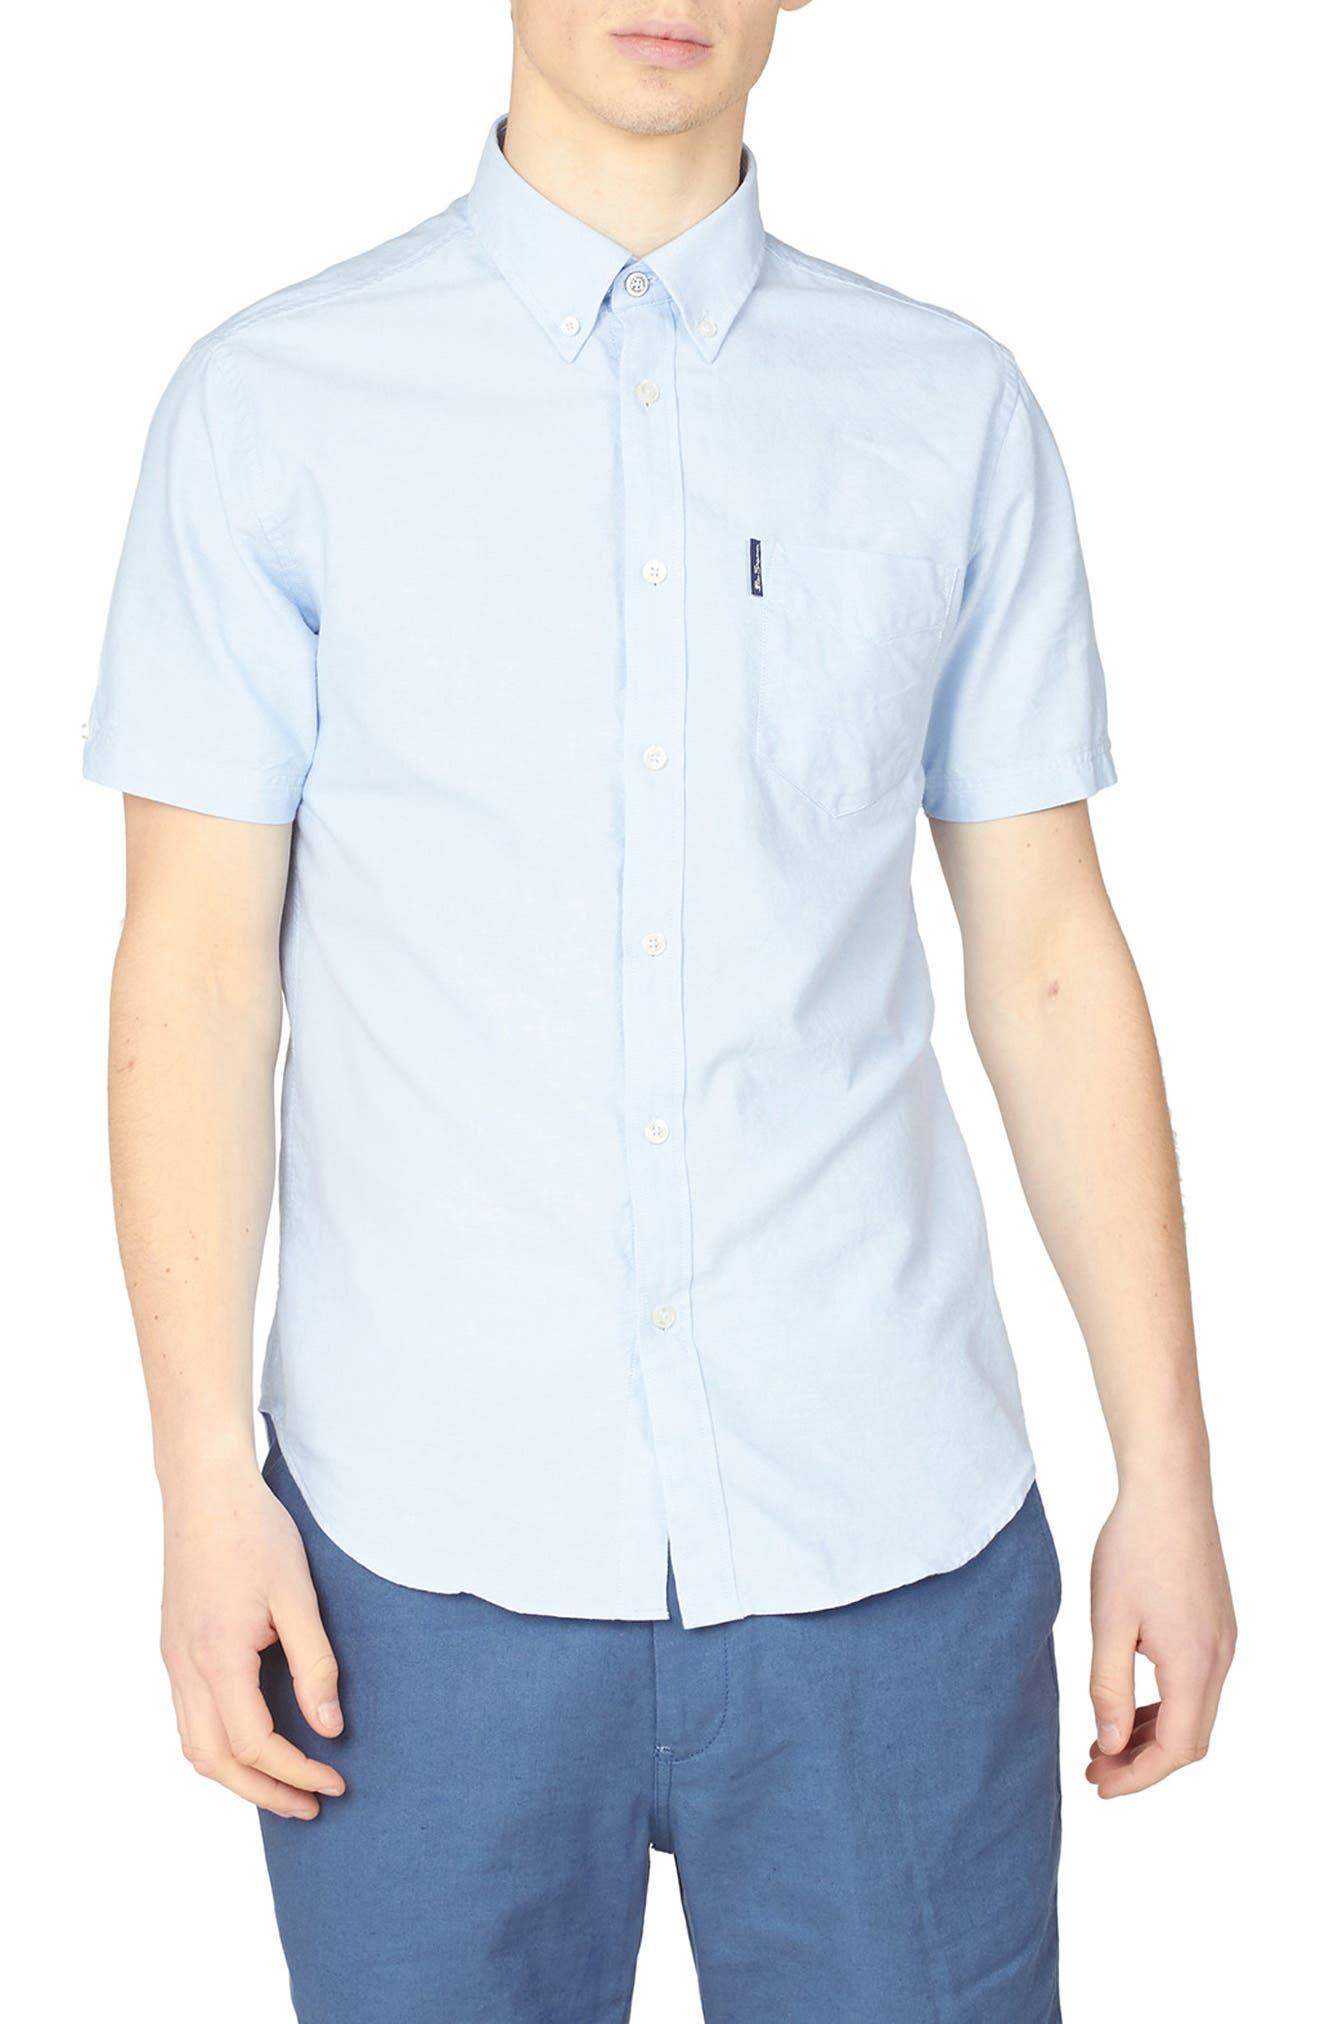 Signature Short Sleeve Oxford Button-Down Shirt